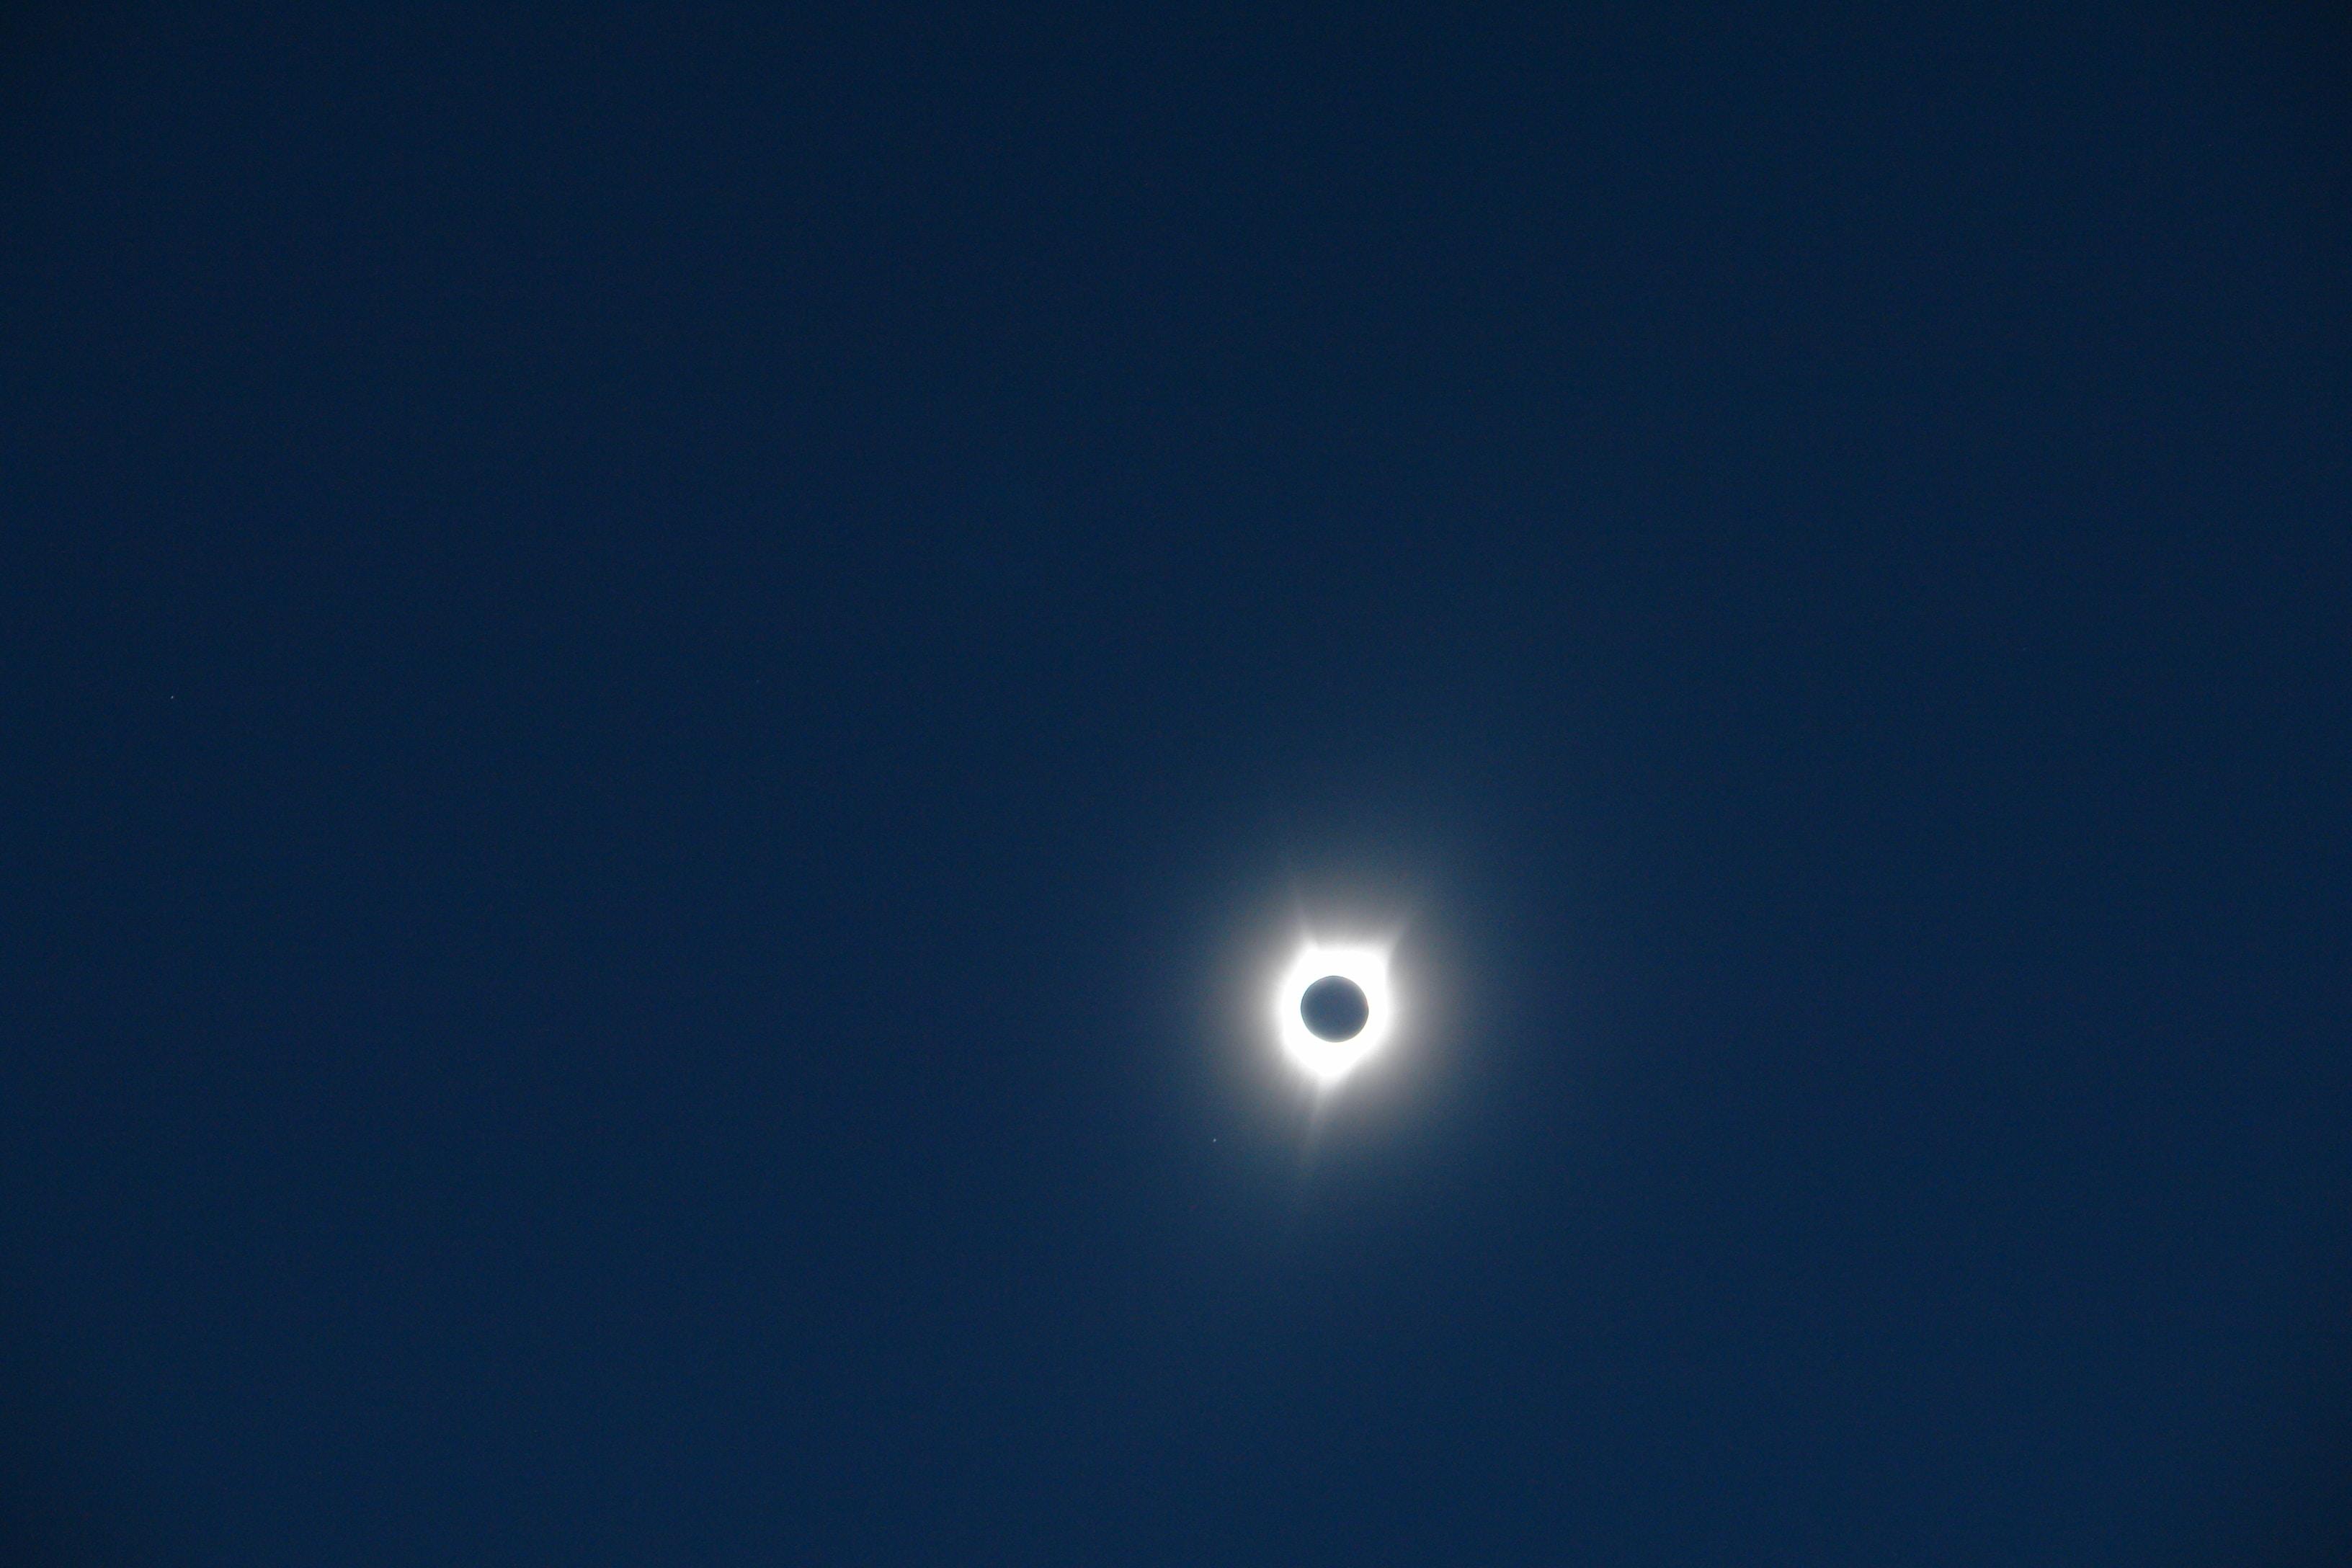 A solar eclipse creating a dark blue sky.